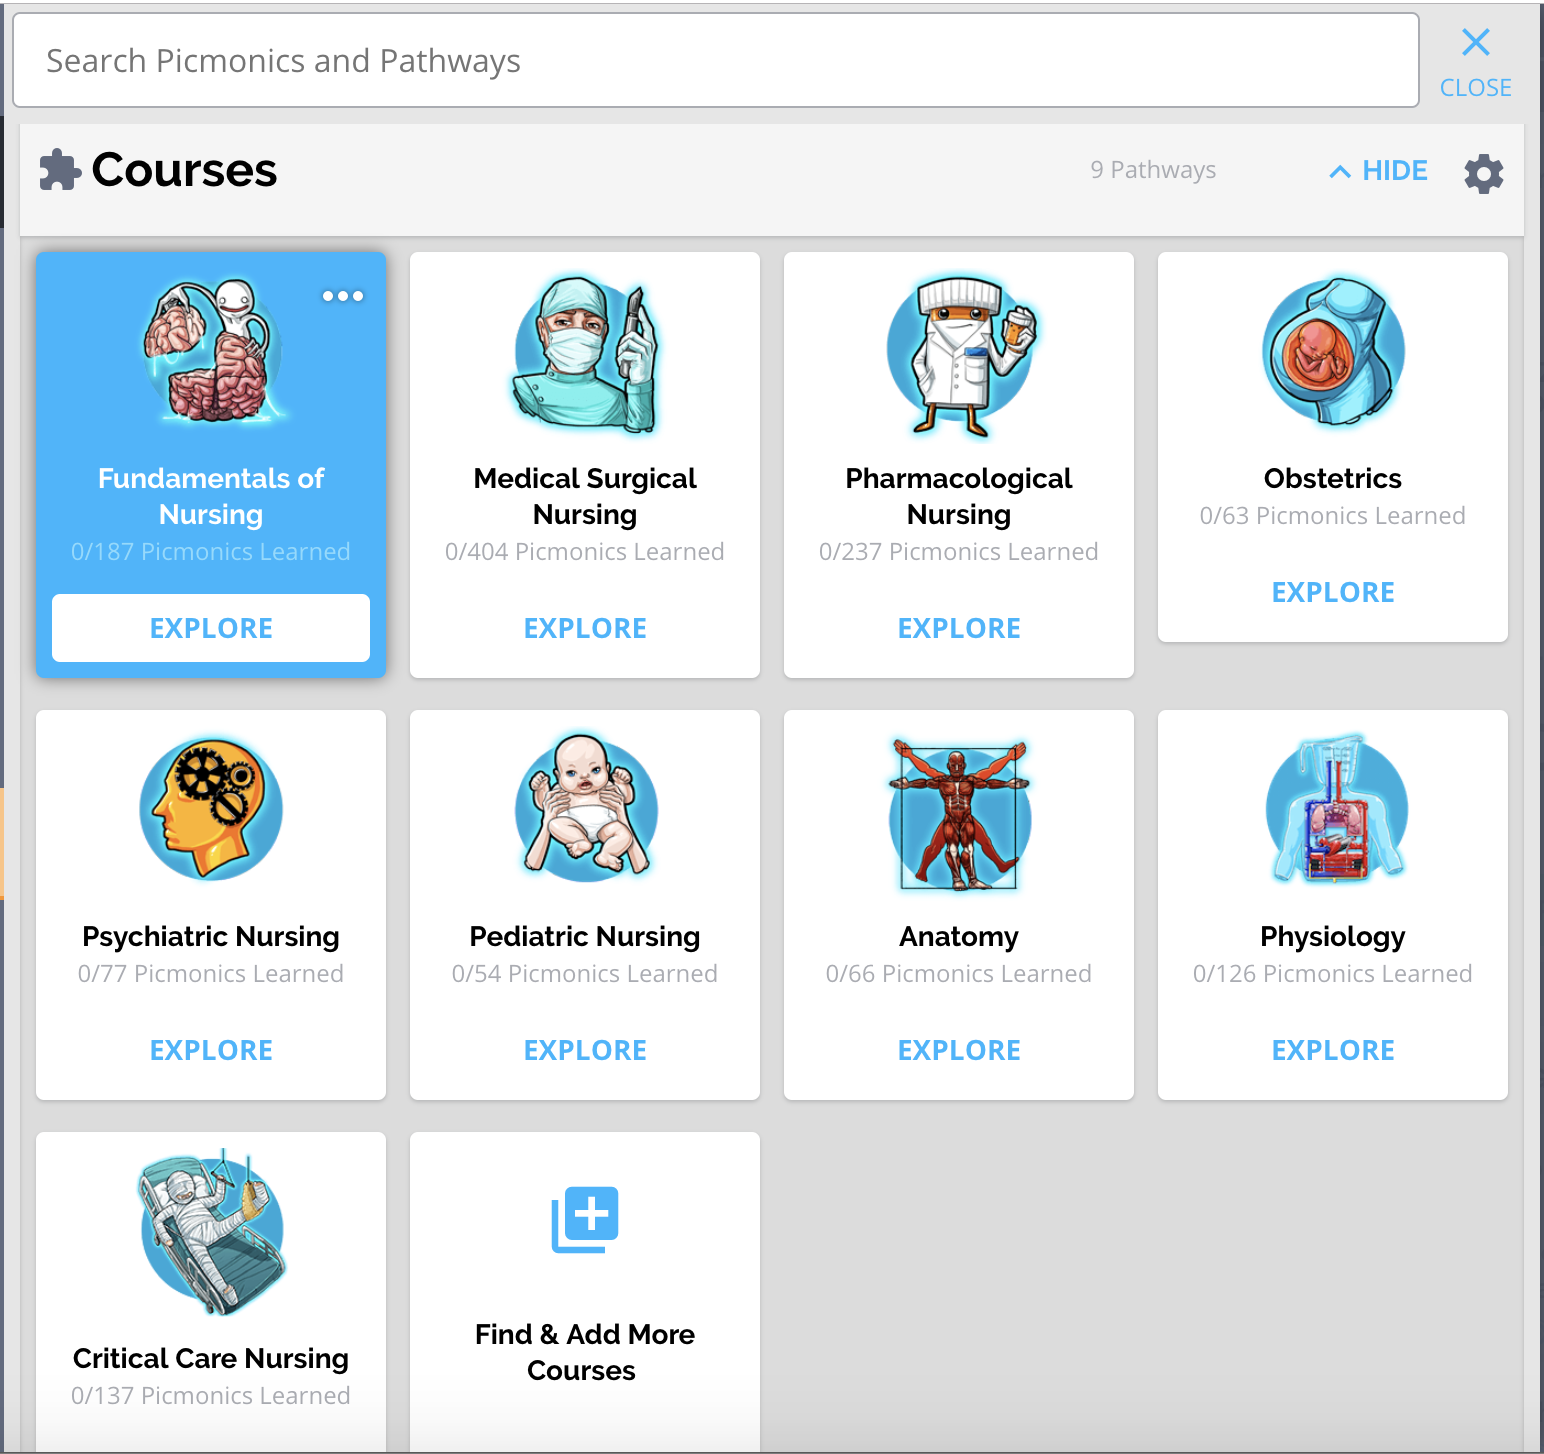 Picmonic for Nursing Vs SketchyNursing: What Nursing